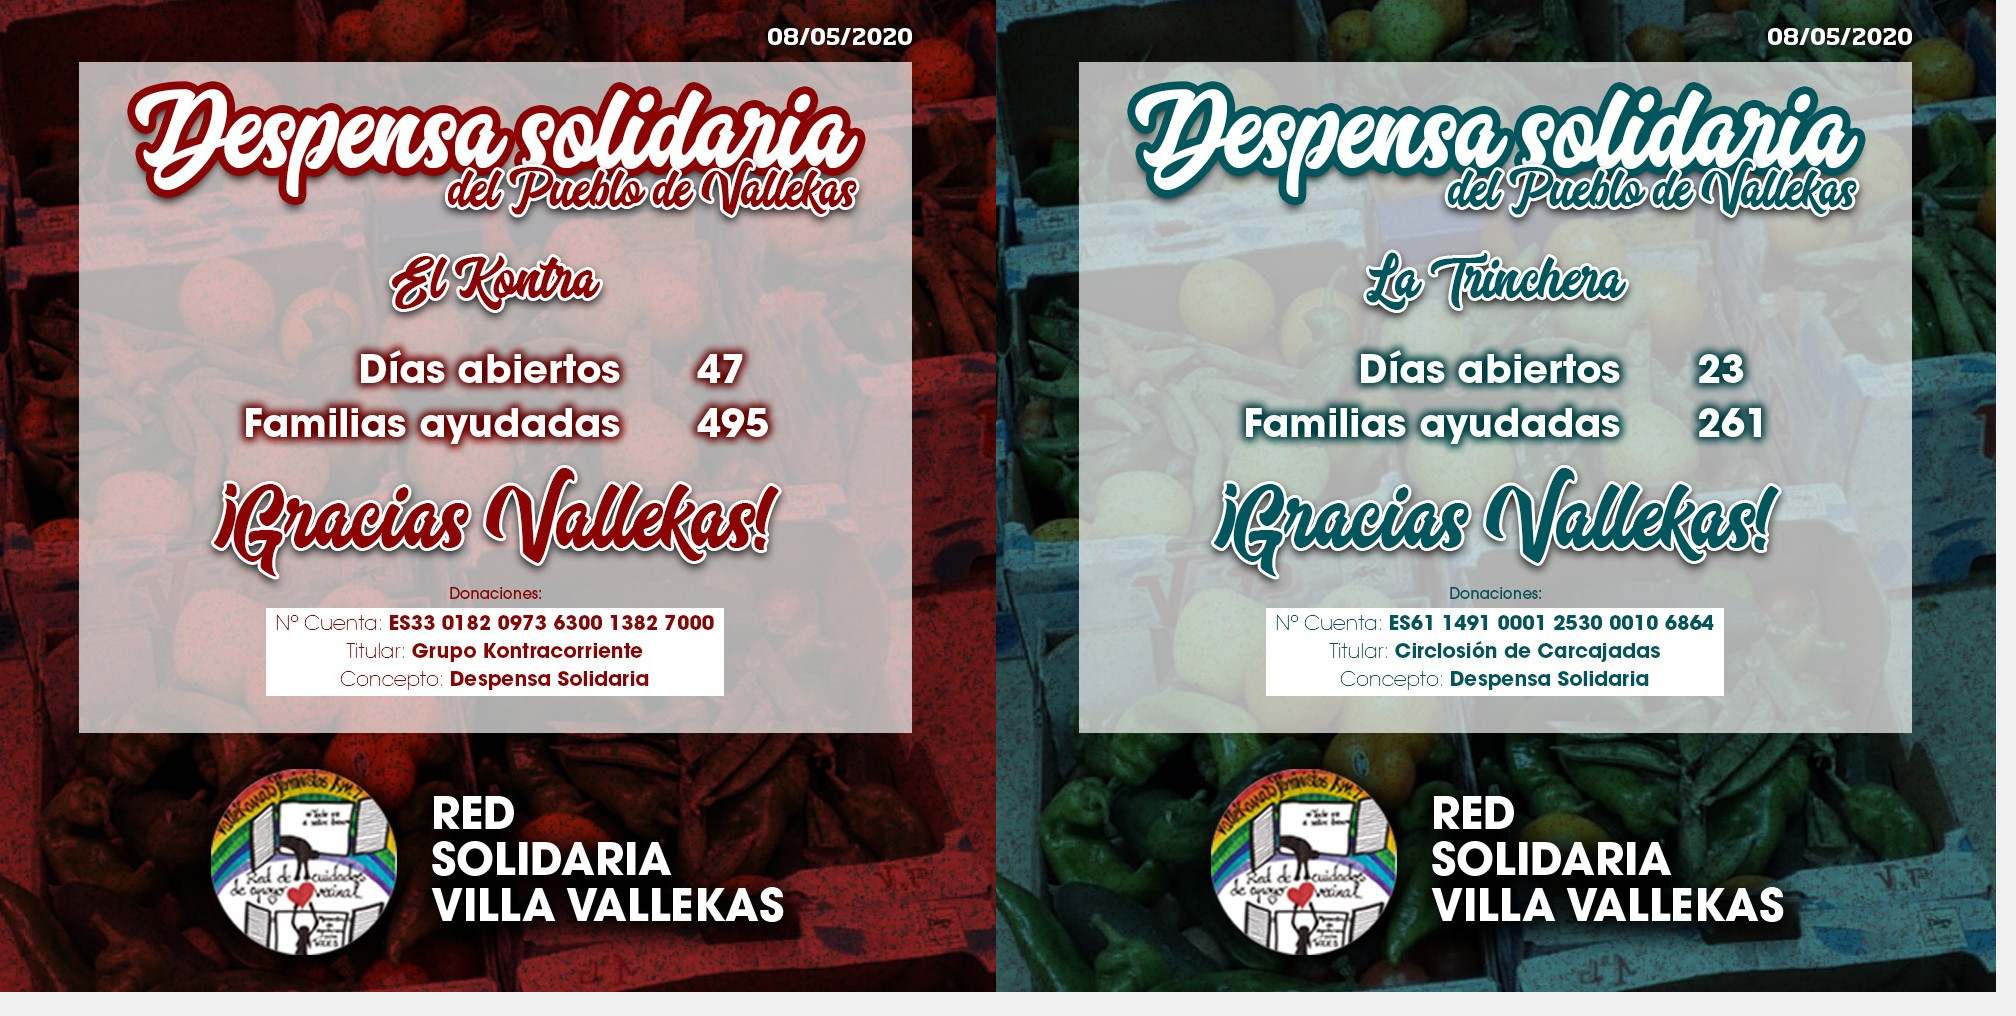 Despendsa solidaria Vallecas